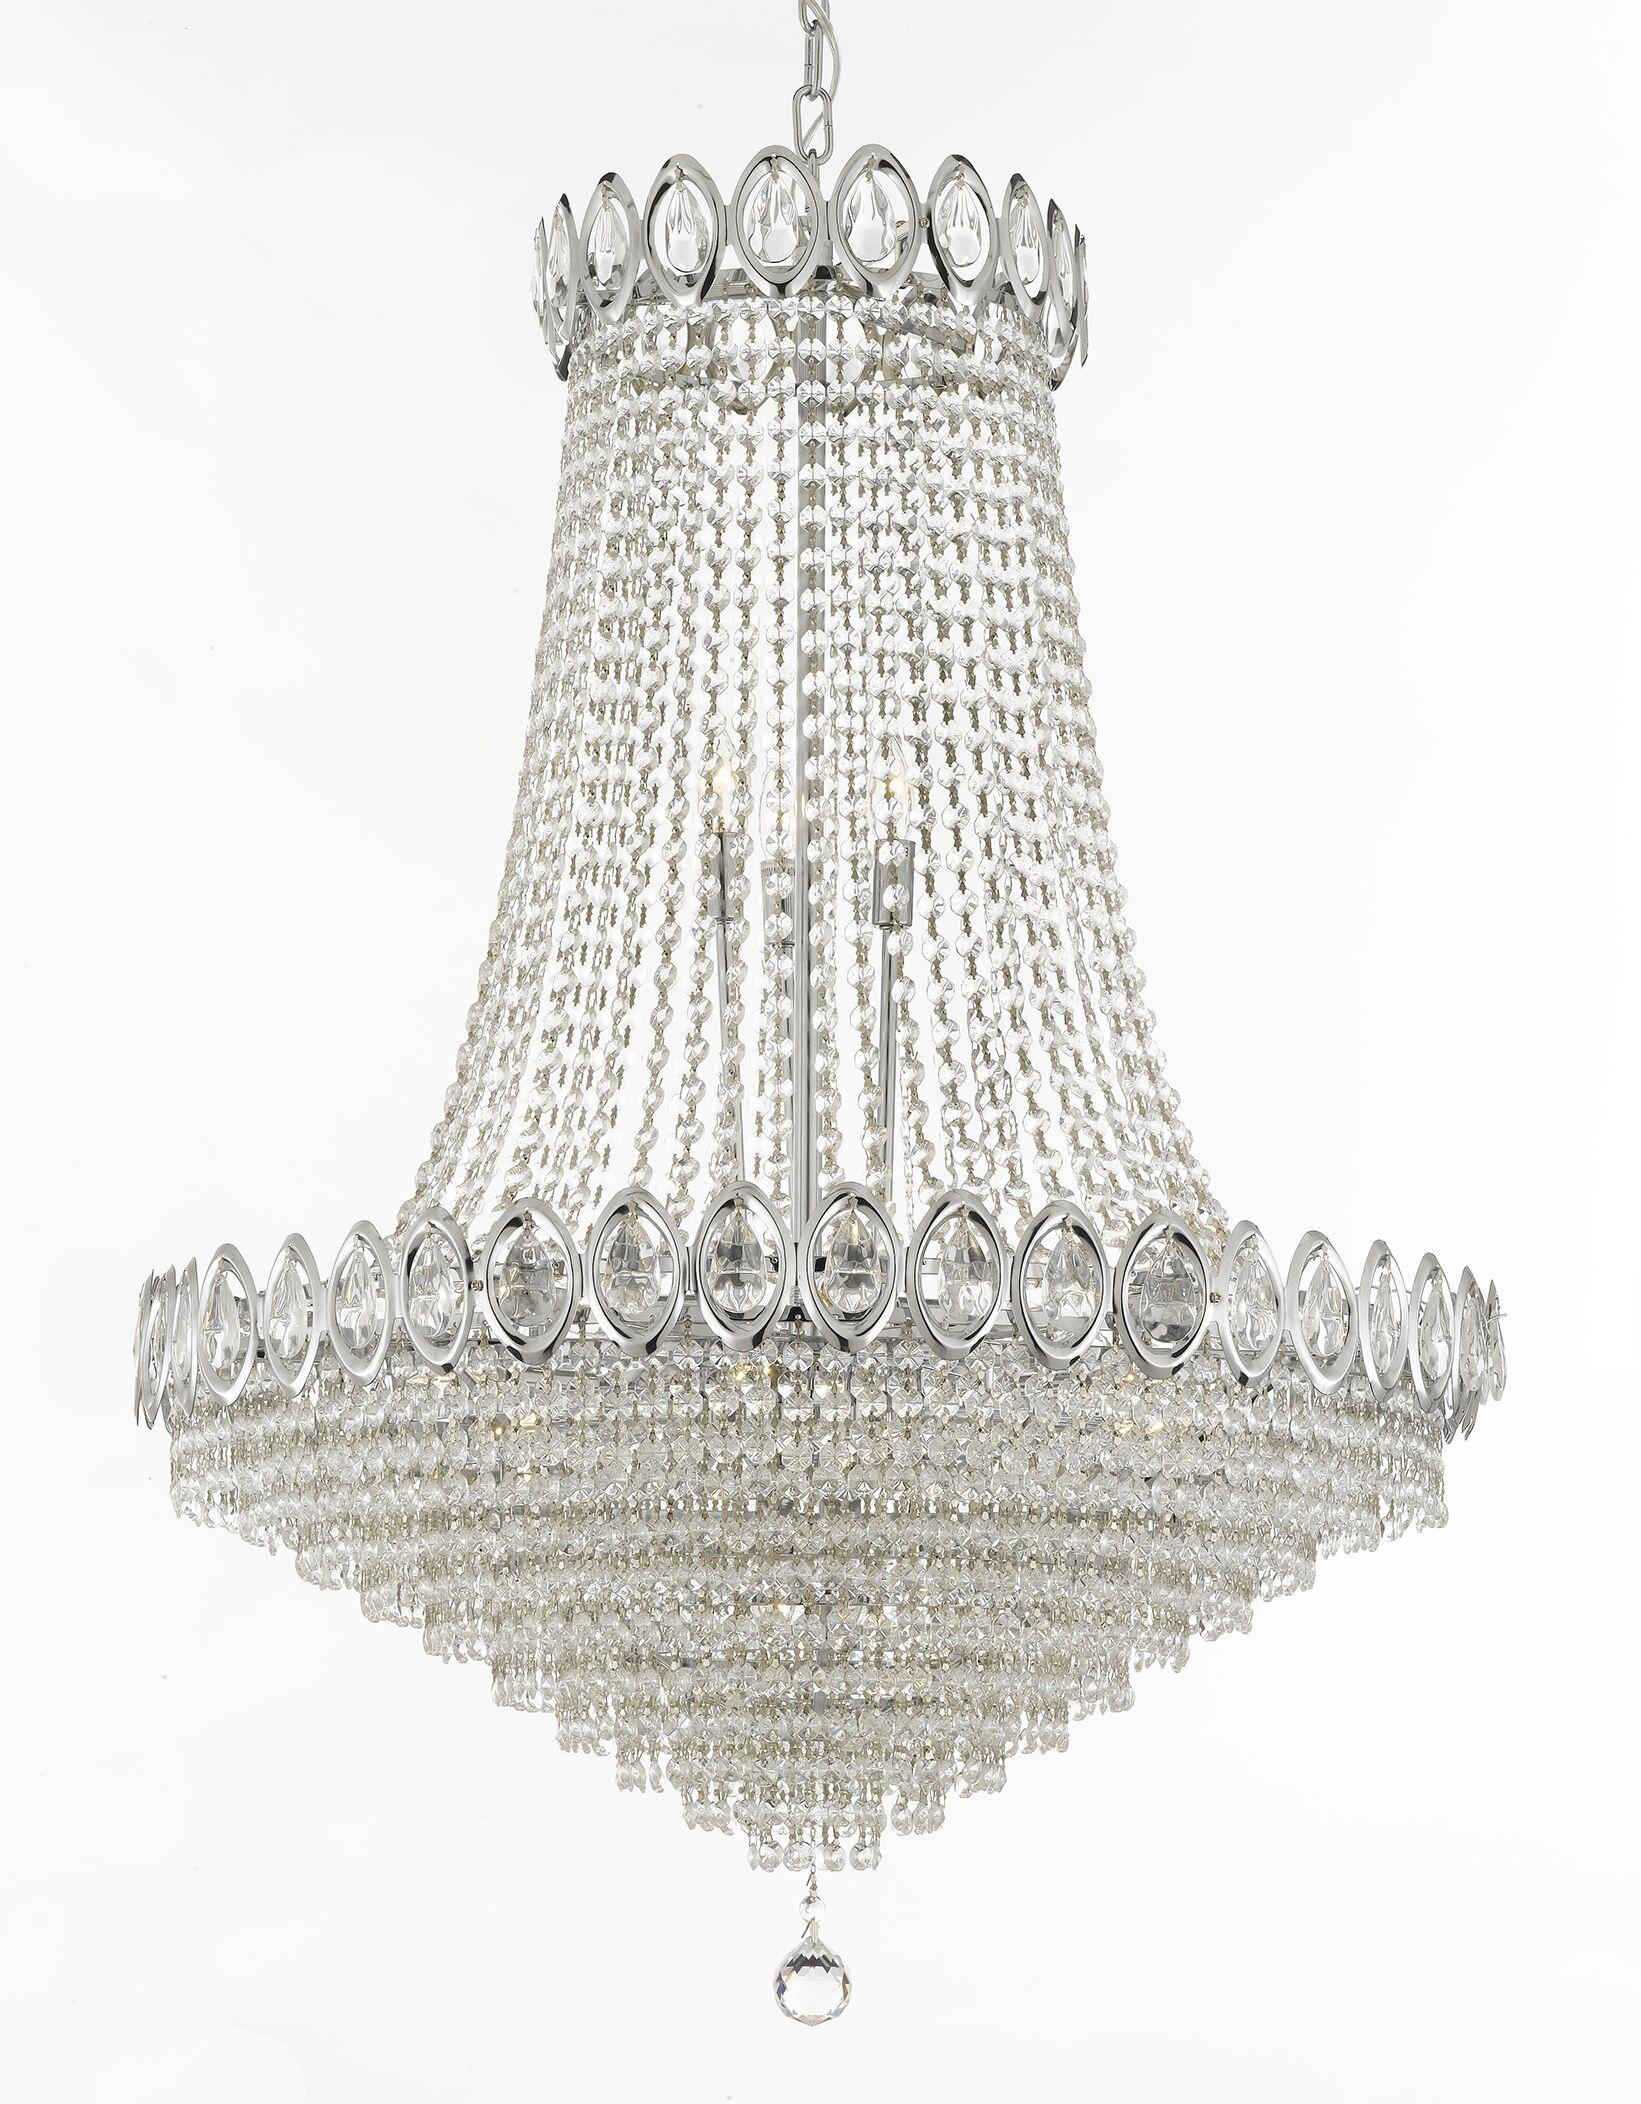 Charvi 9-Light Chandelier Finish: Silver